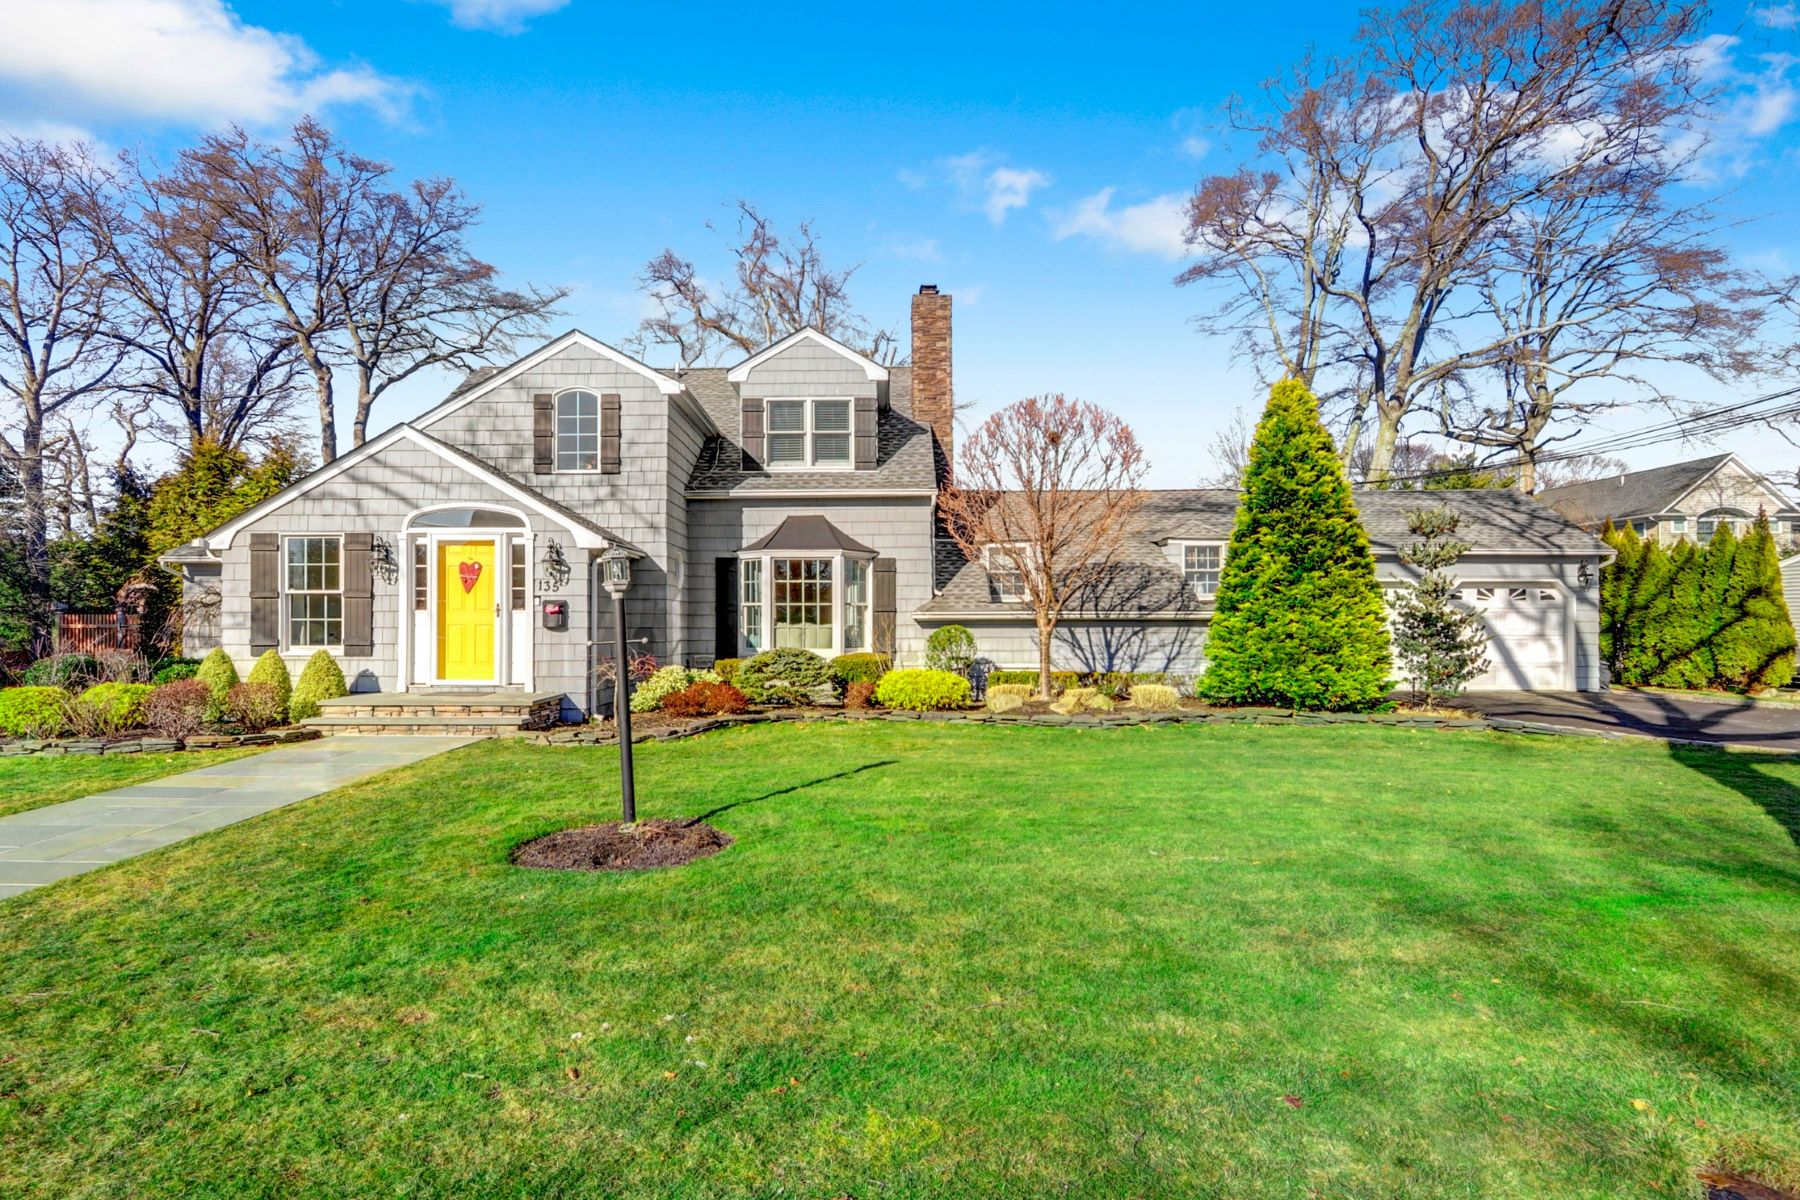 Single Family Homes for Active at Massapequa 135 Shoreham Road Massapequa, New York 11758 United States